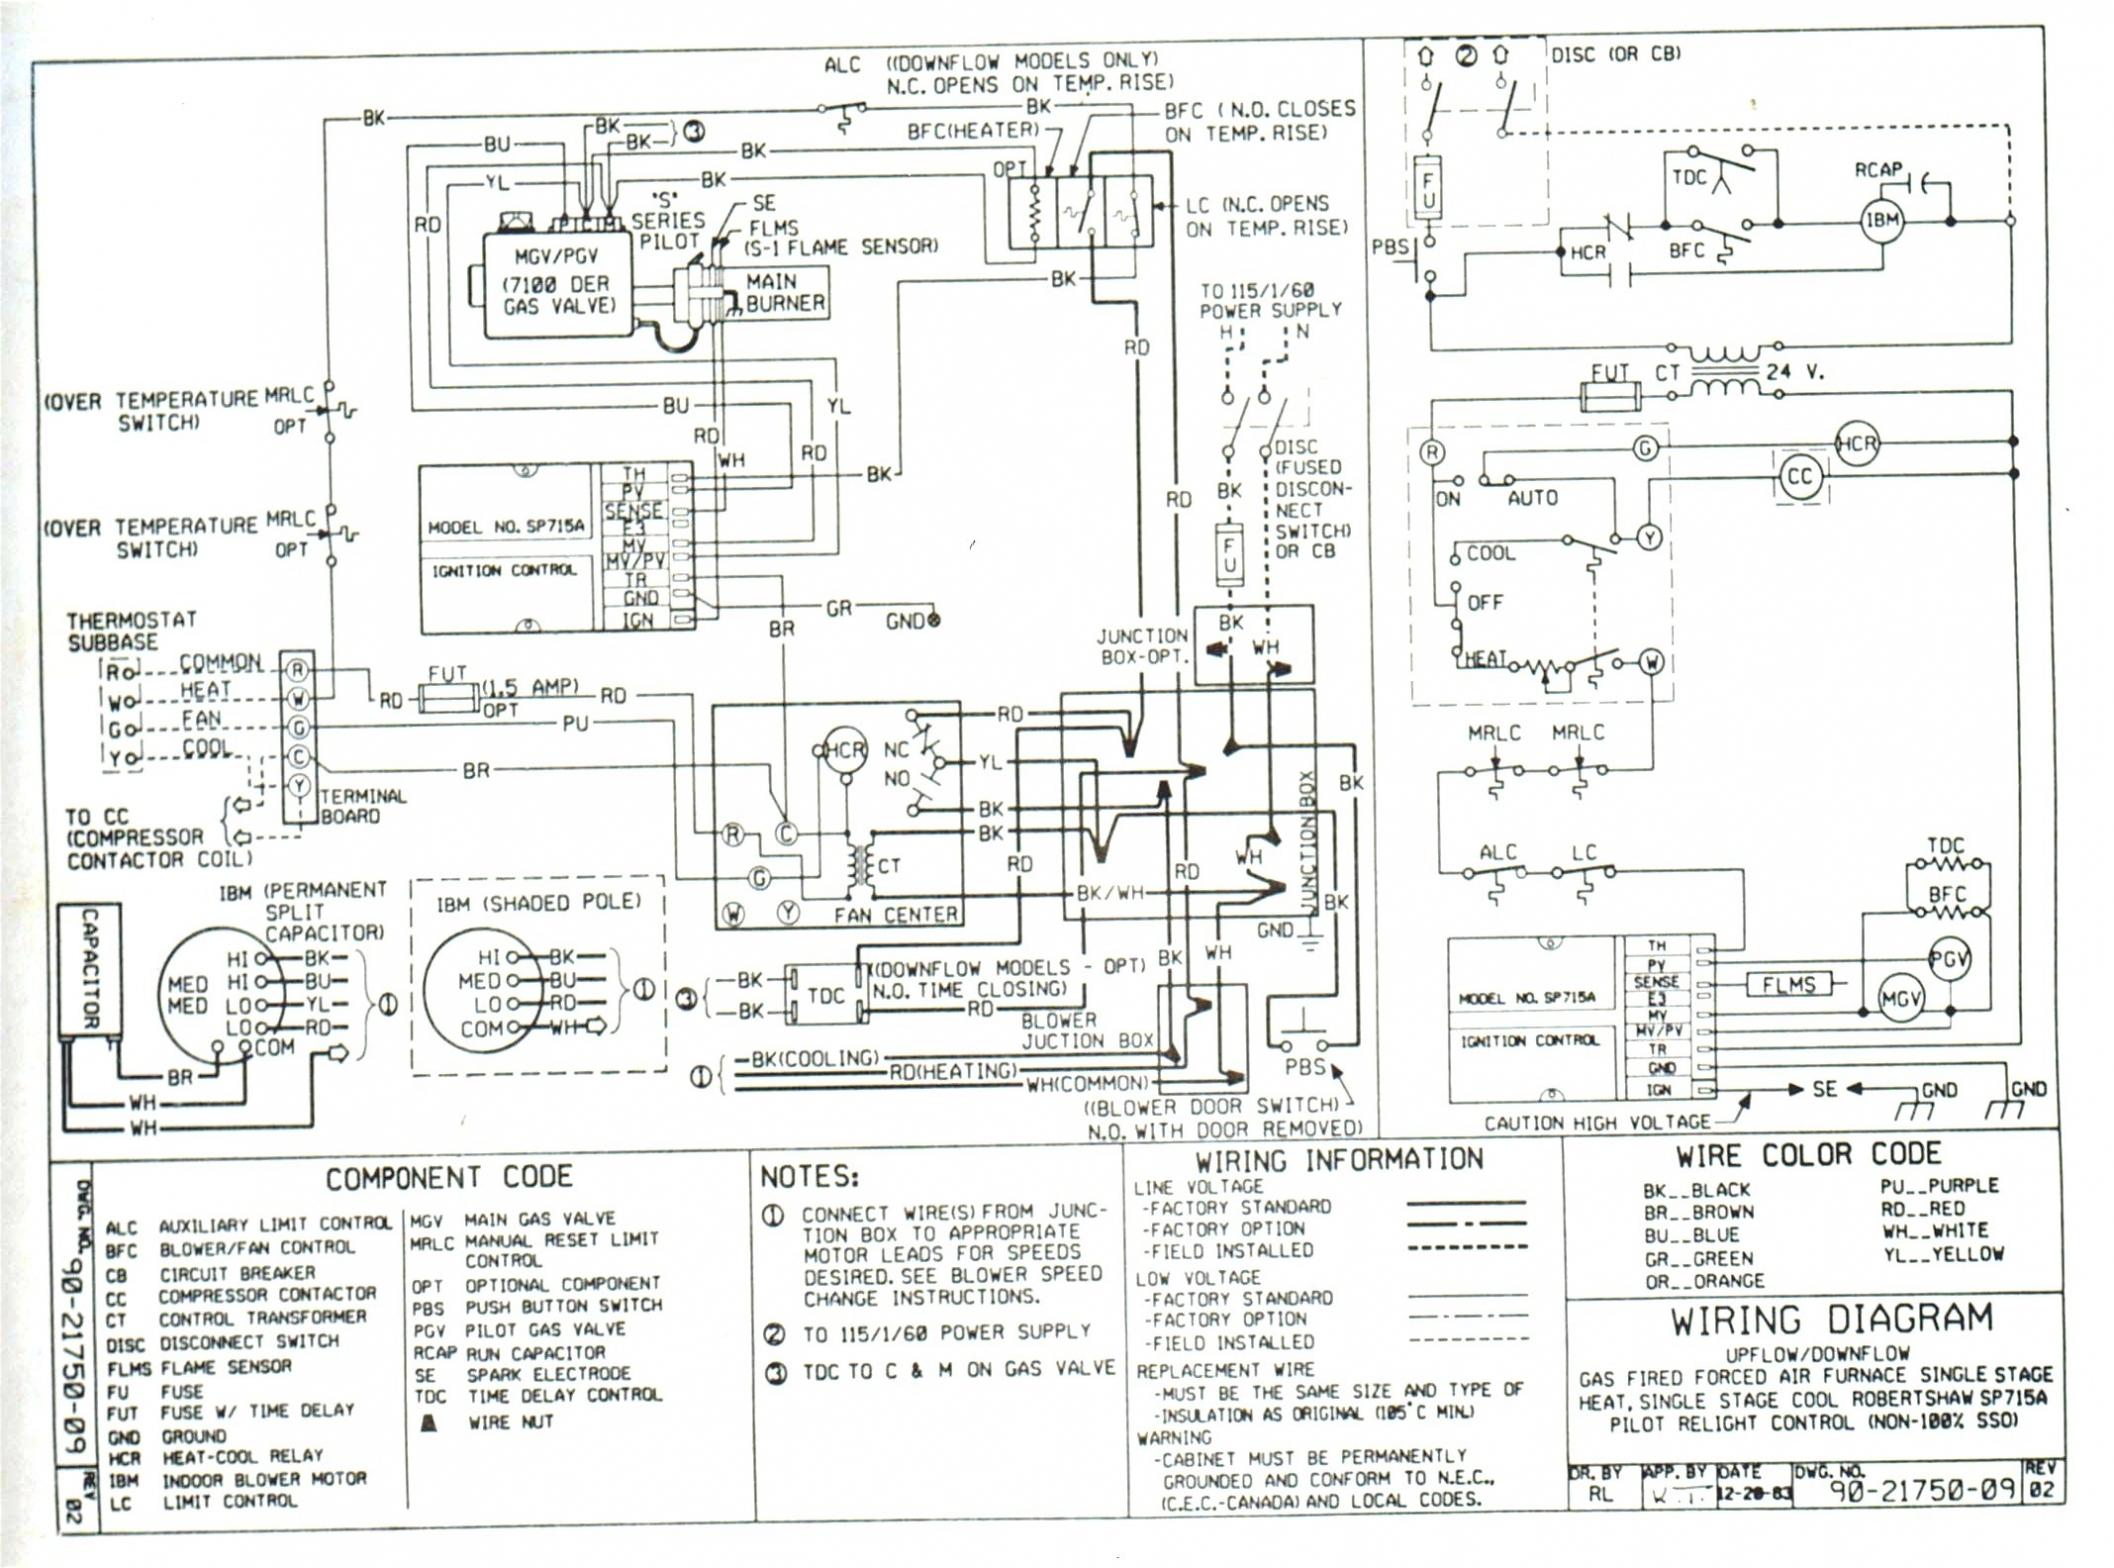 Goodman Air Handler Fan Relay Wiring Diagram Free Picture | Wiring - Air Handler Fan Relay Wiring Diagram